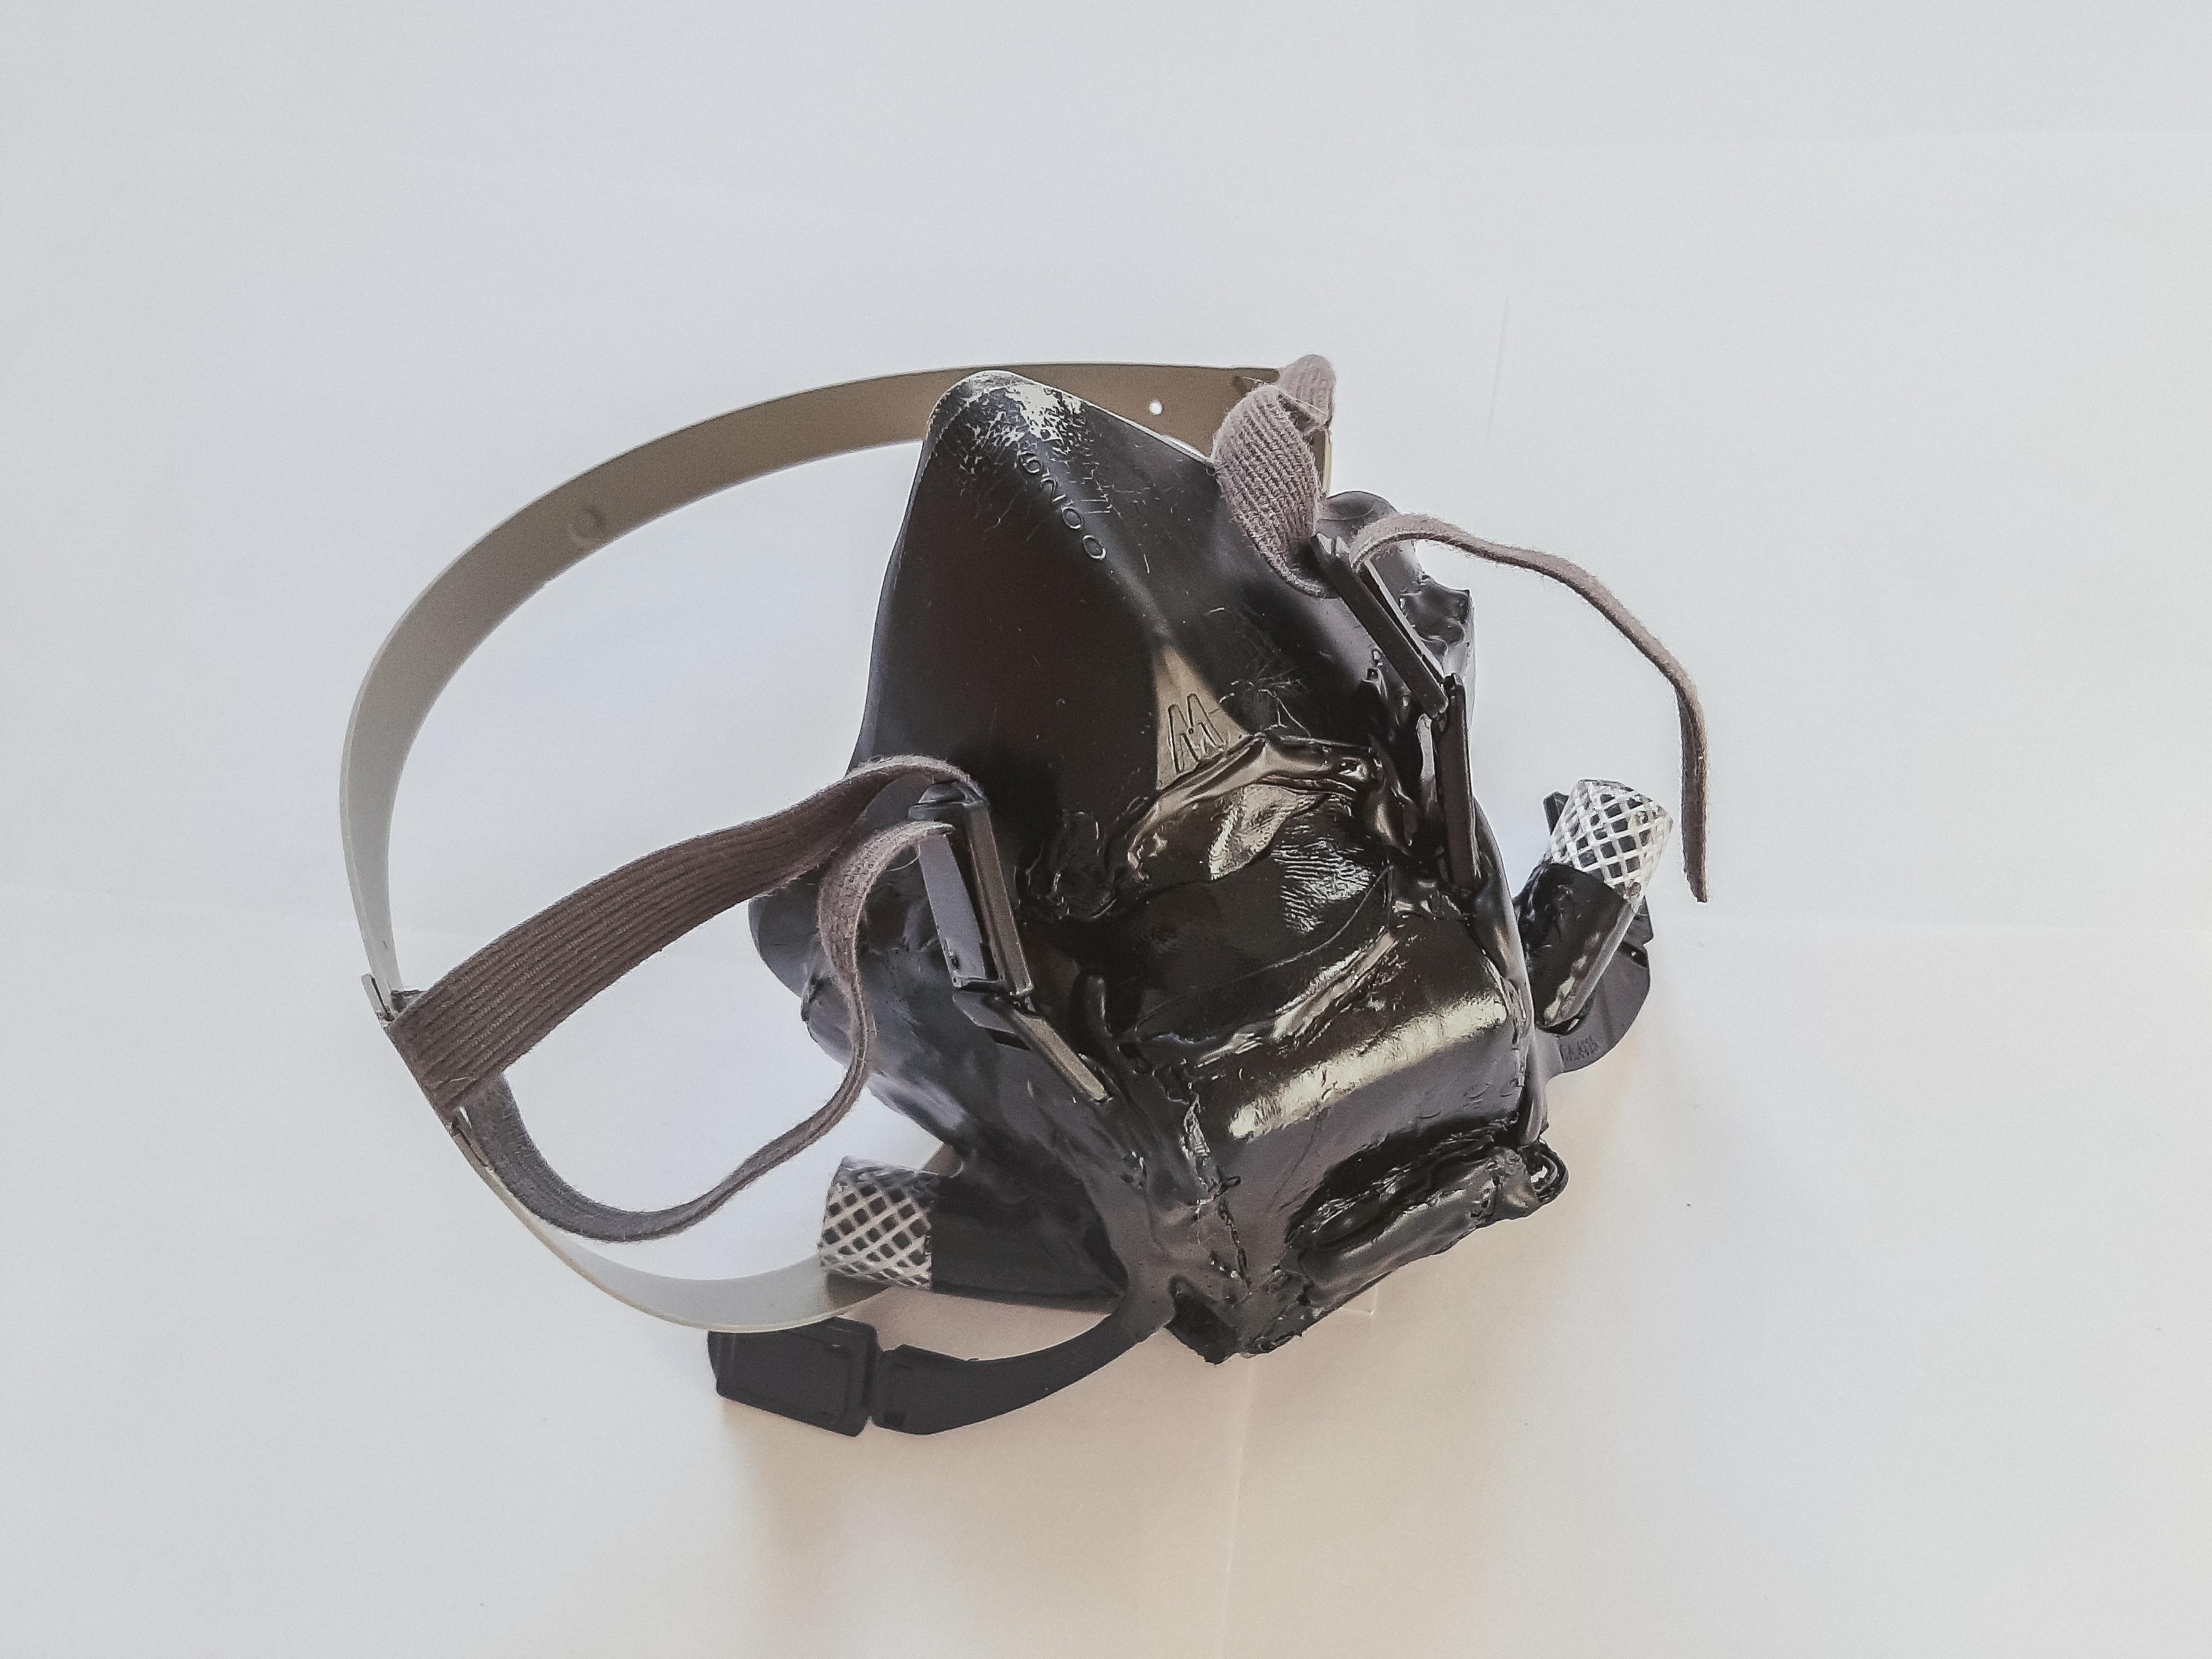 First Prototype of Breathio UVMask